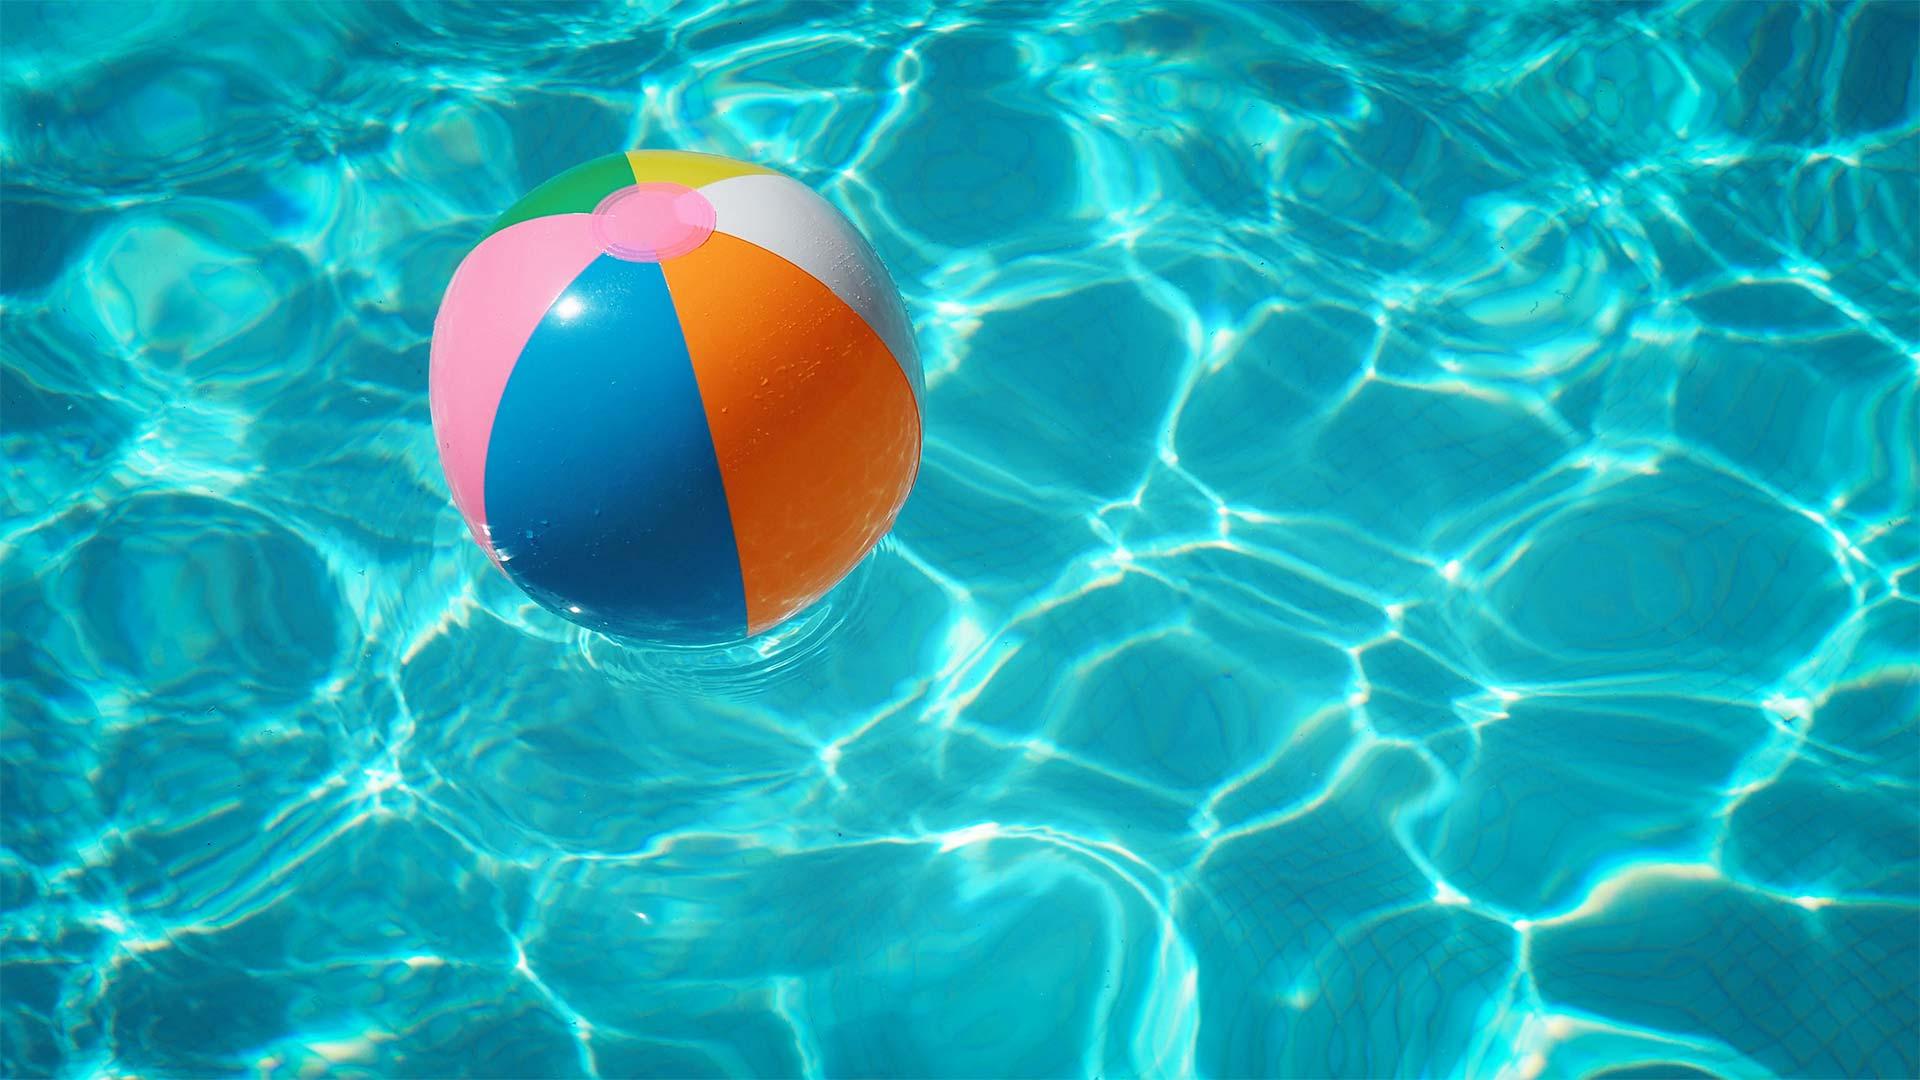 Ball treibt im Pool